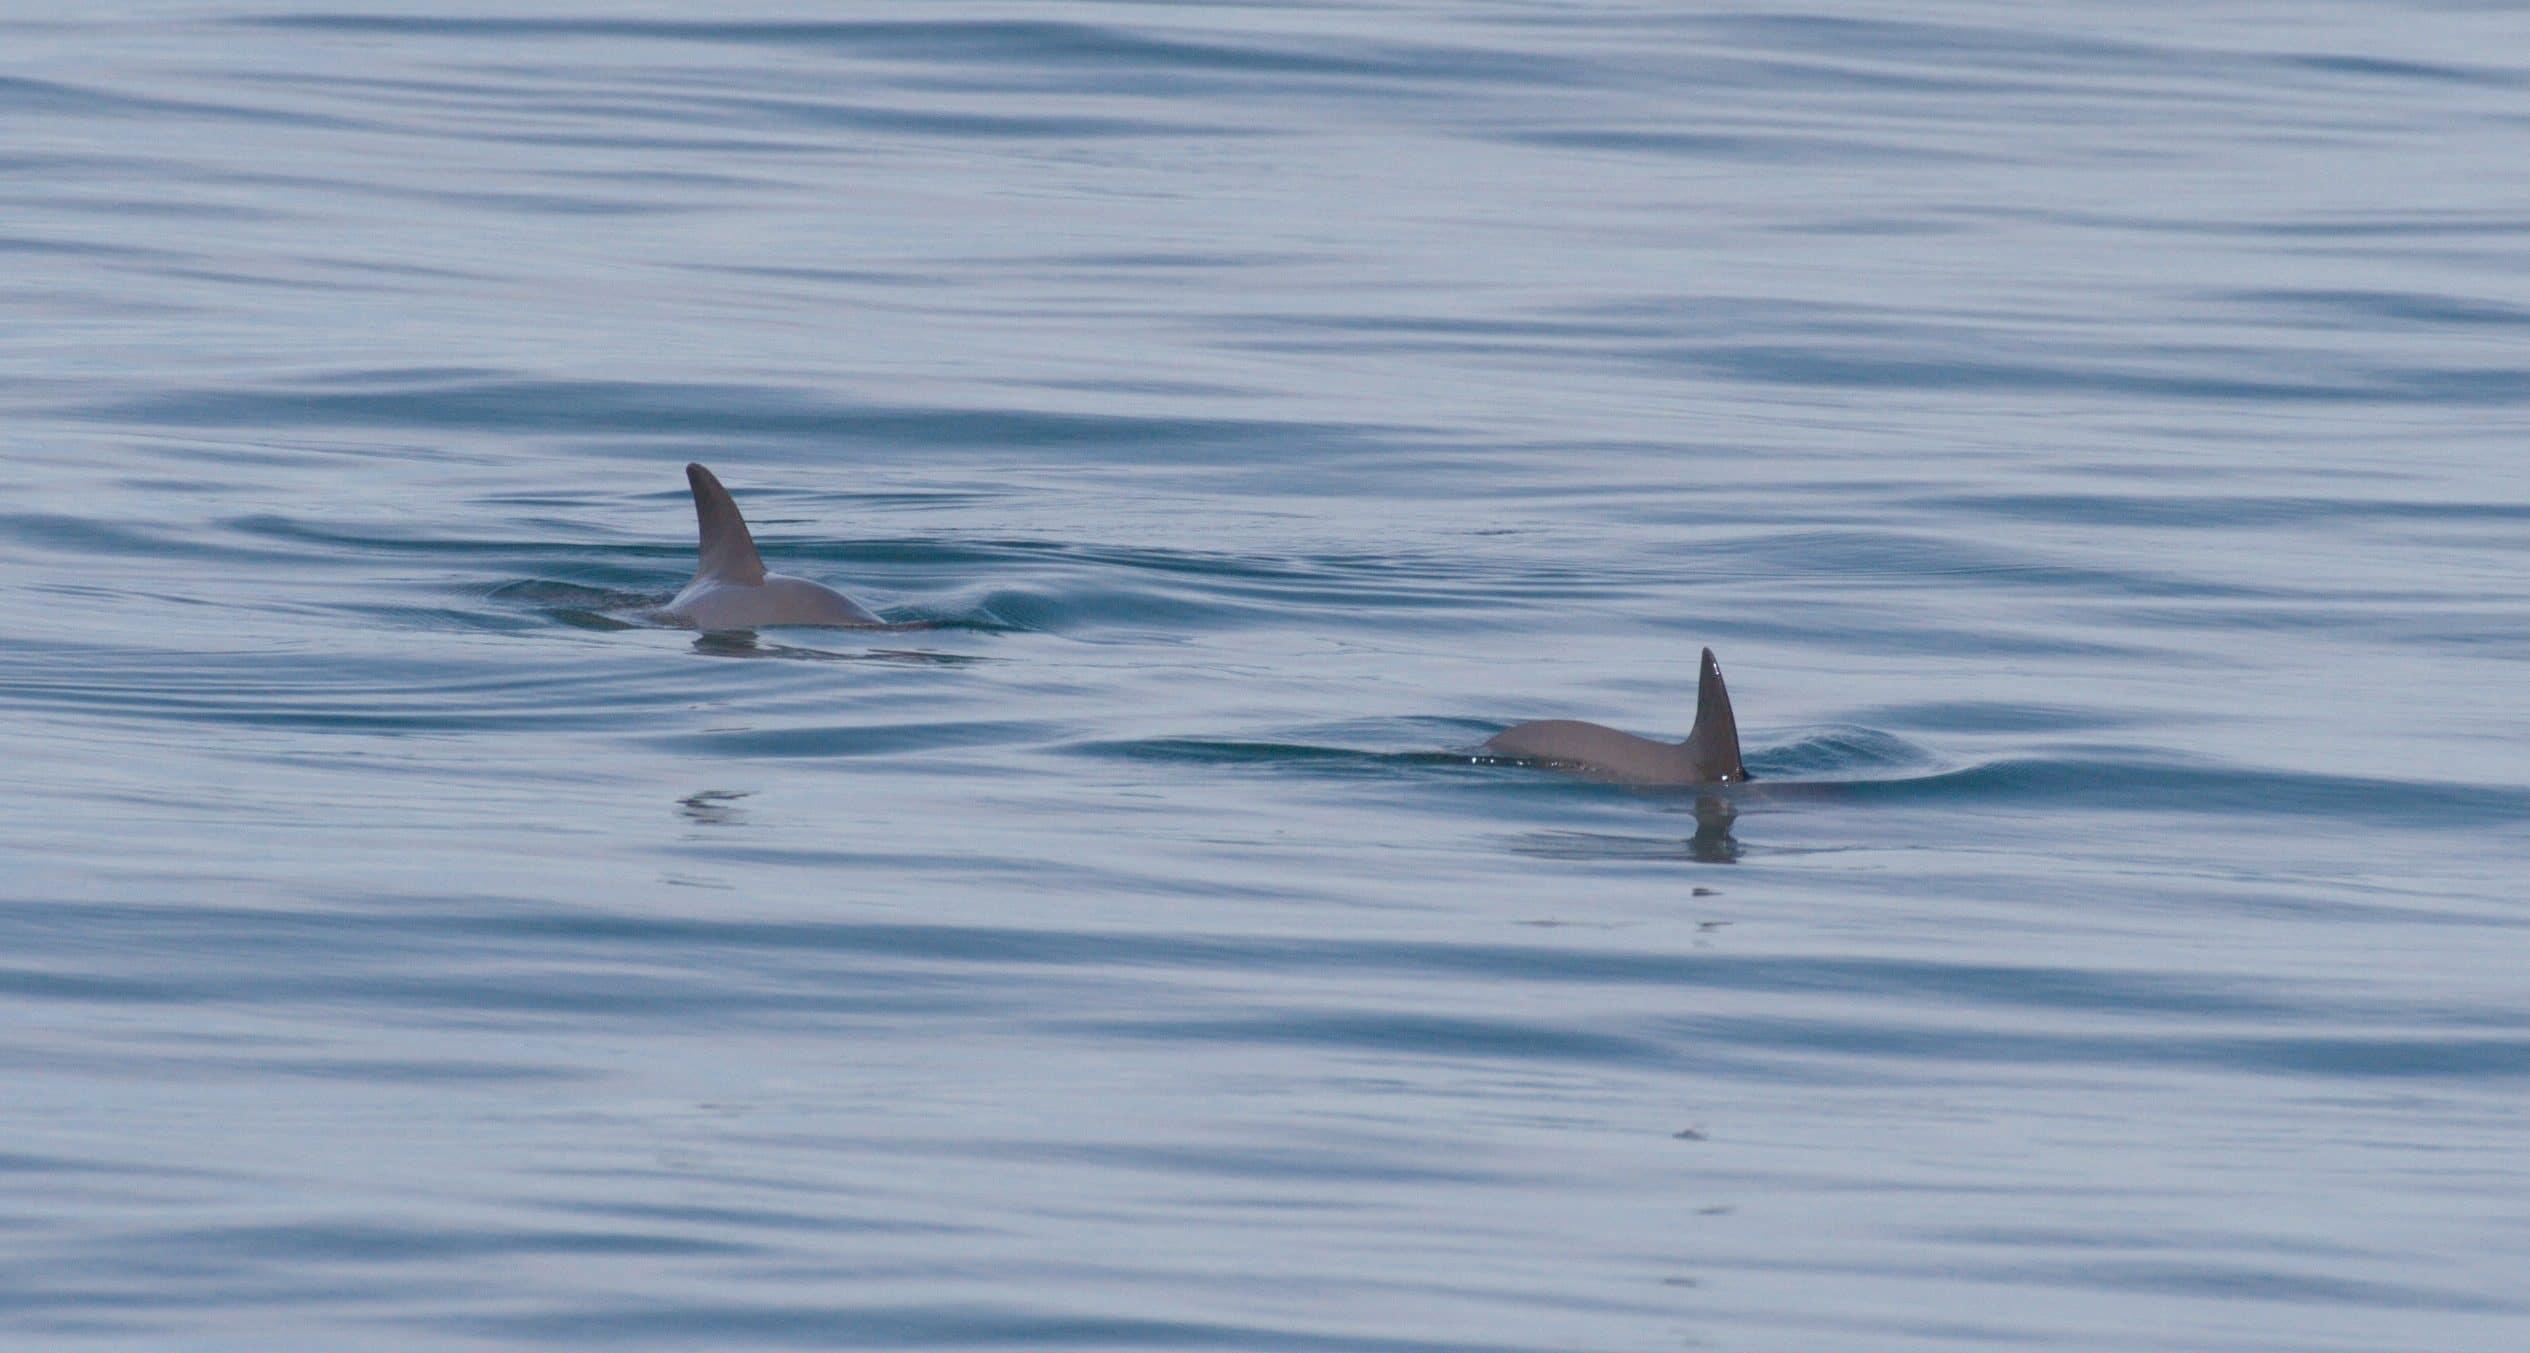 Two vaquita surfacing